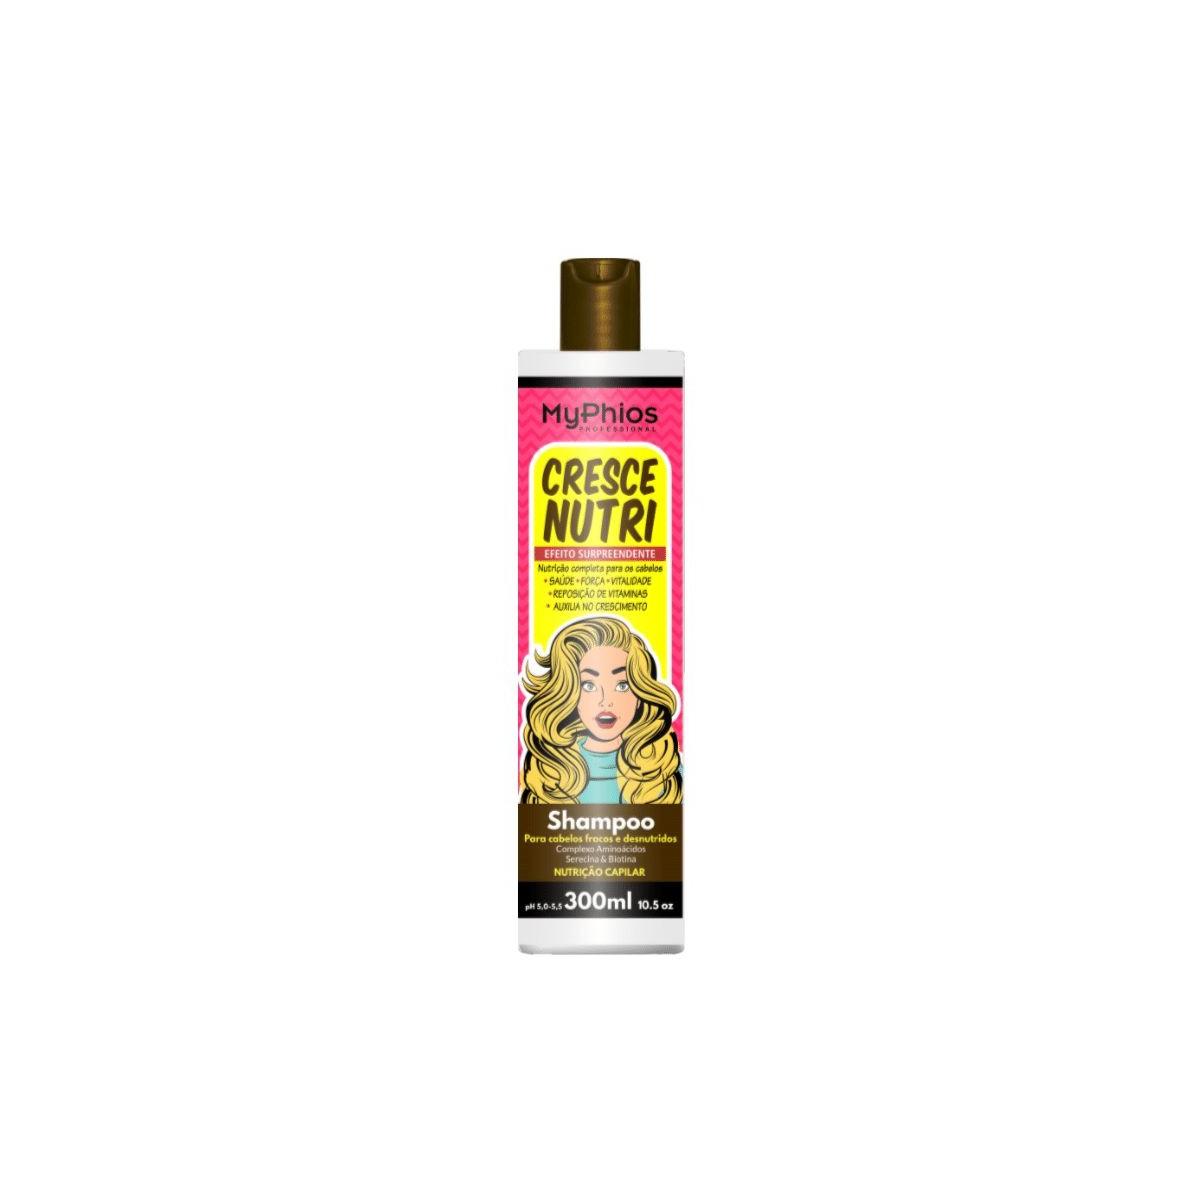 My Phios Cresce e Nutri - Shampoo 300ml